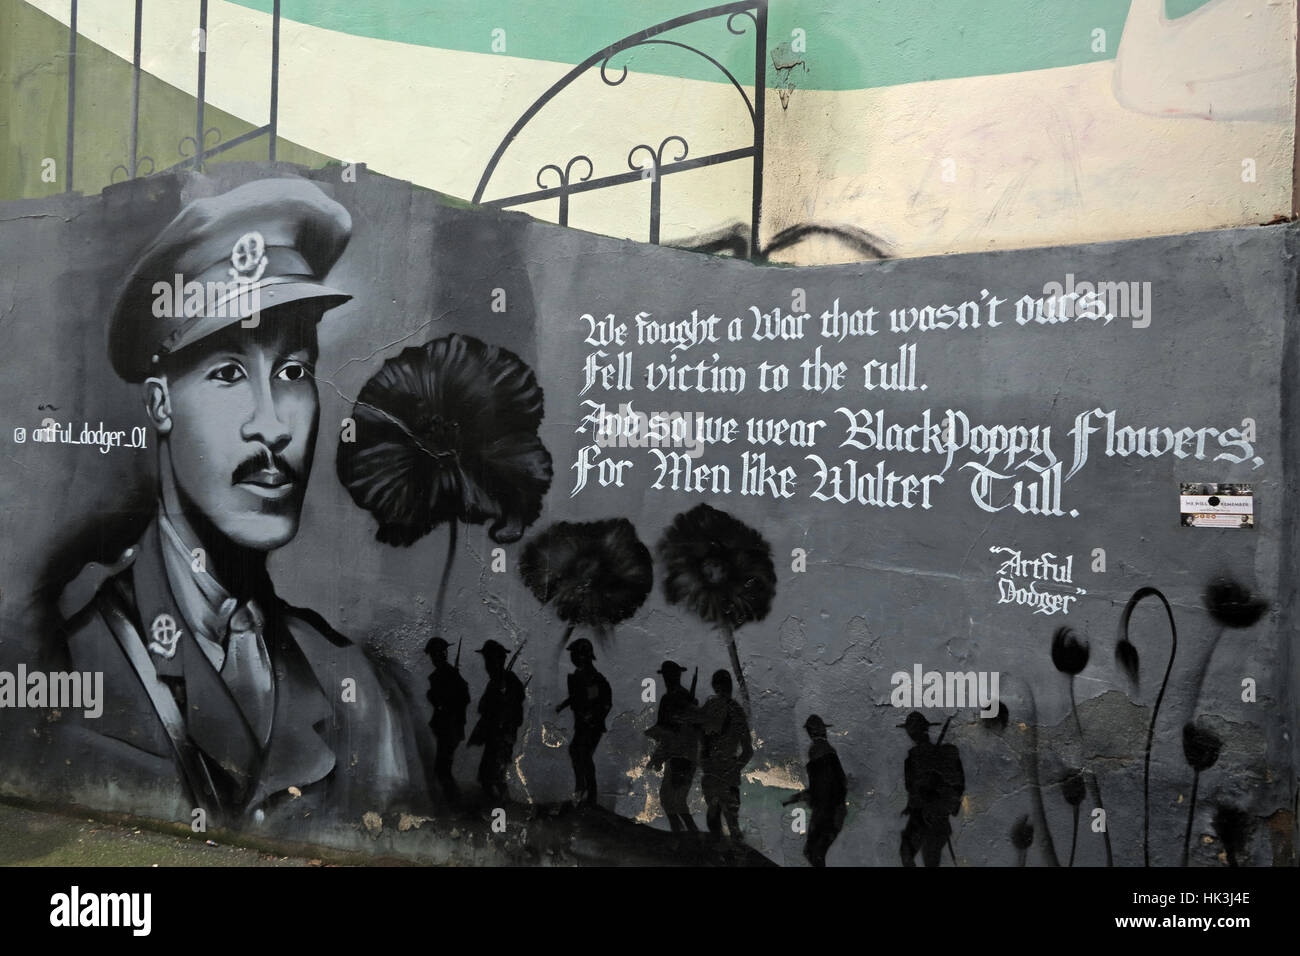 Brixton,England,UK,Bellefields,Road,city,centre,One,love,luv,street,BRXTN,city,of,London,BlackPoppy,artful,dodger,mural,commemoration,commonwealth,soldier,soldiers,Bellefields